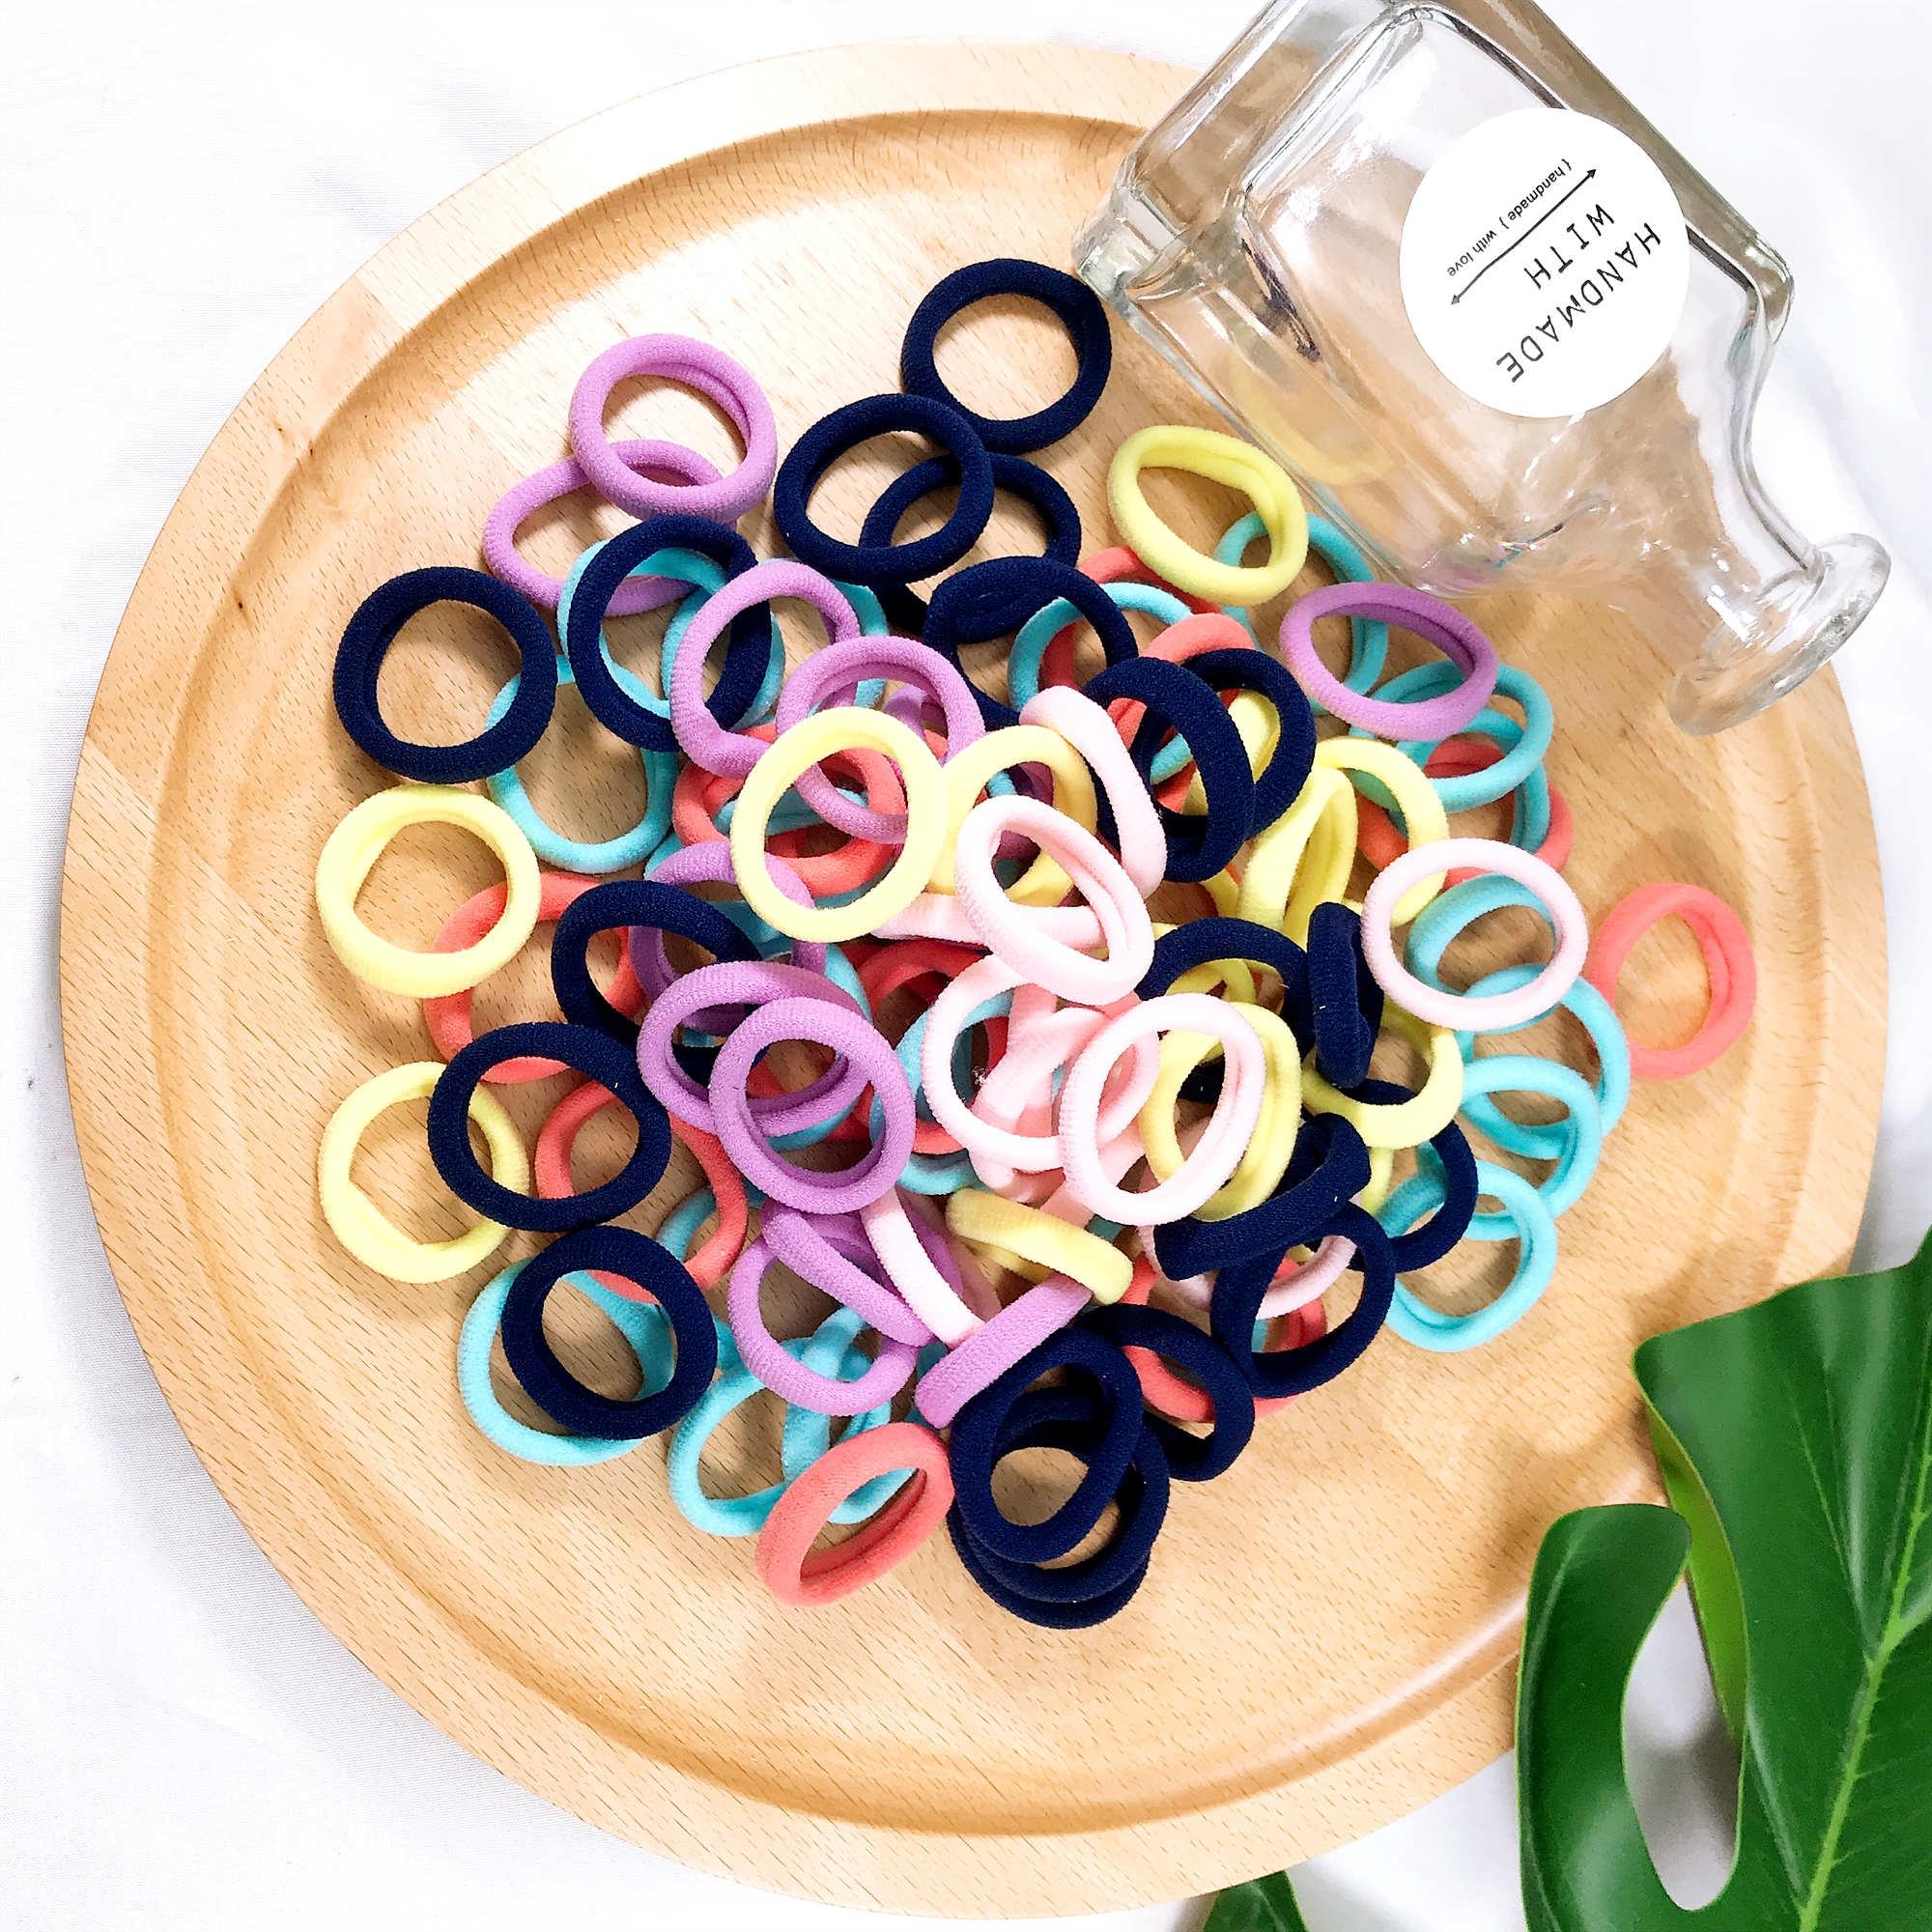 10PCS Fashion Colorful 3cm Mini Rubber Band Cotton Hair Bands Women Small Elastics Girl's Tie Gum Hair Accessories